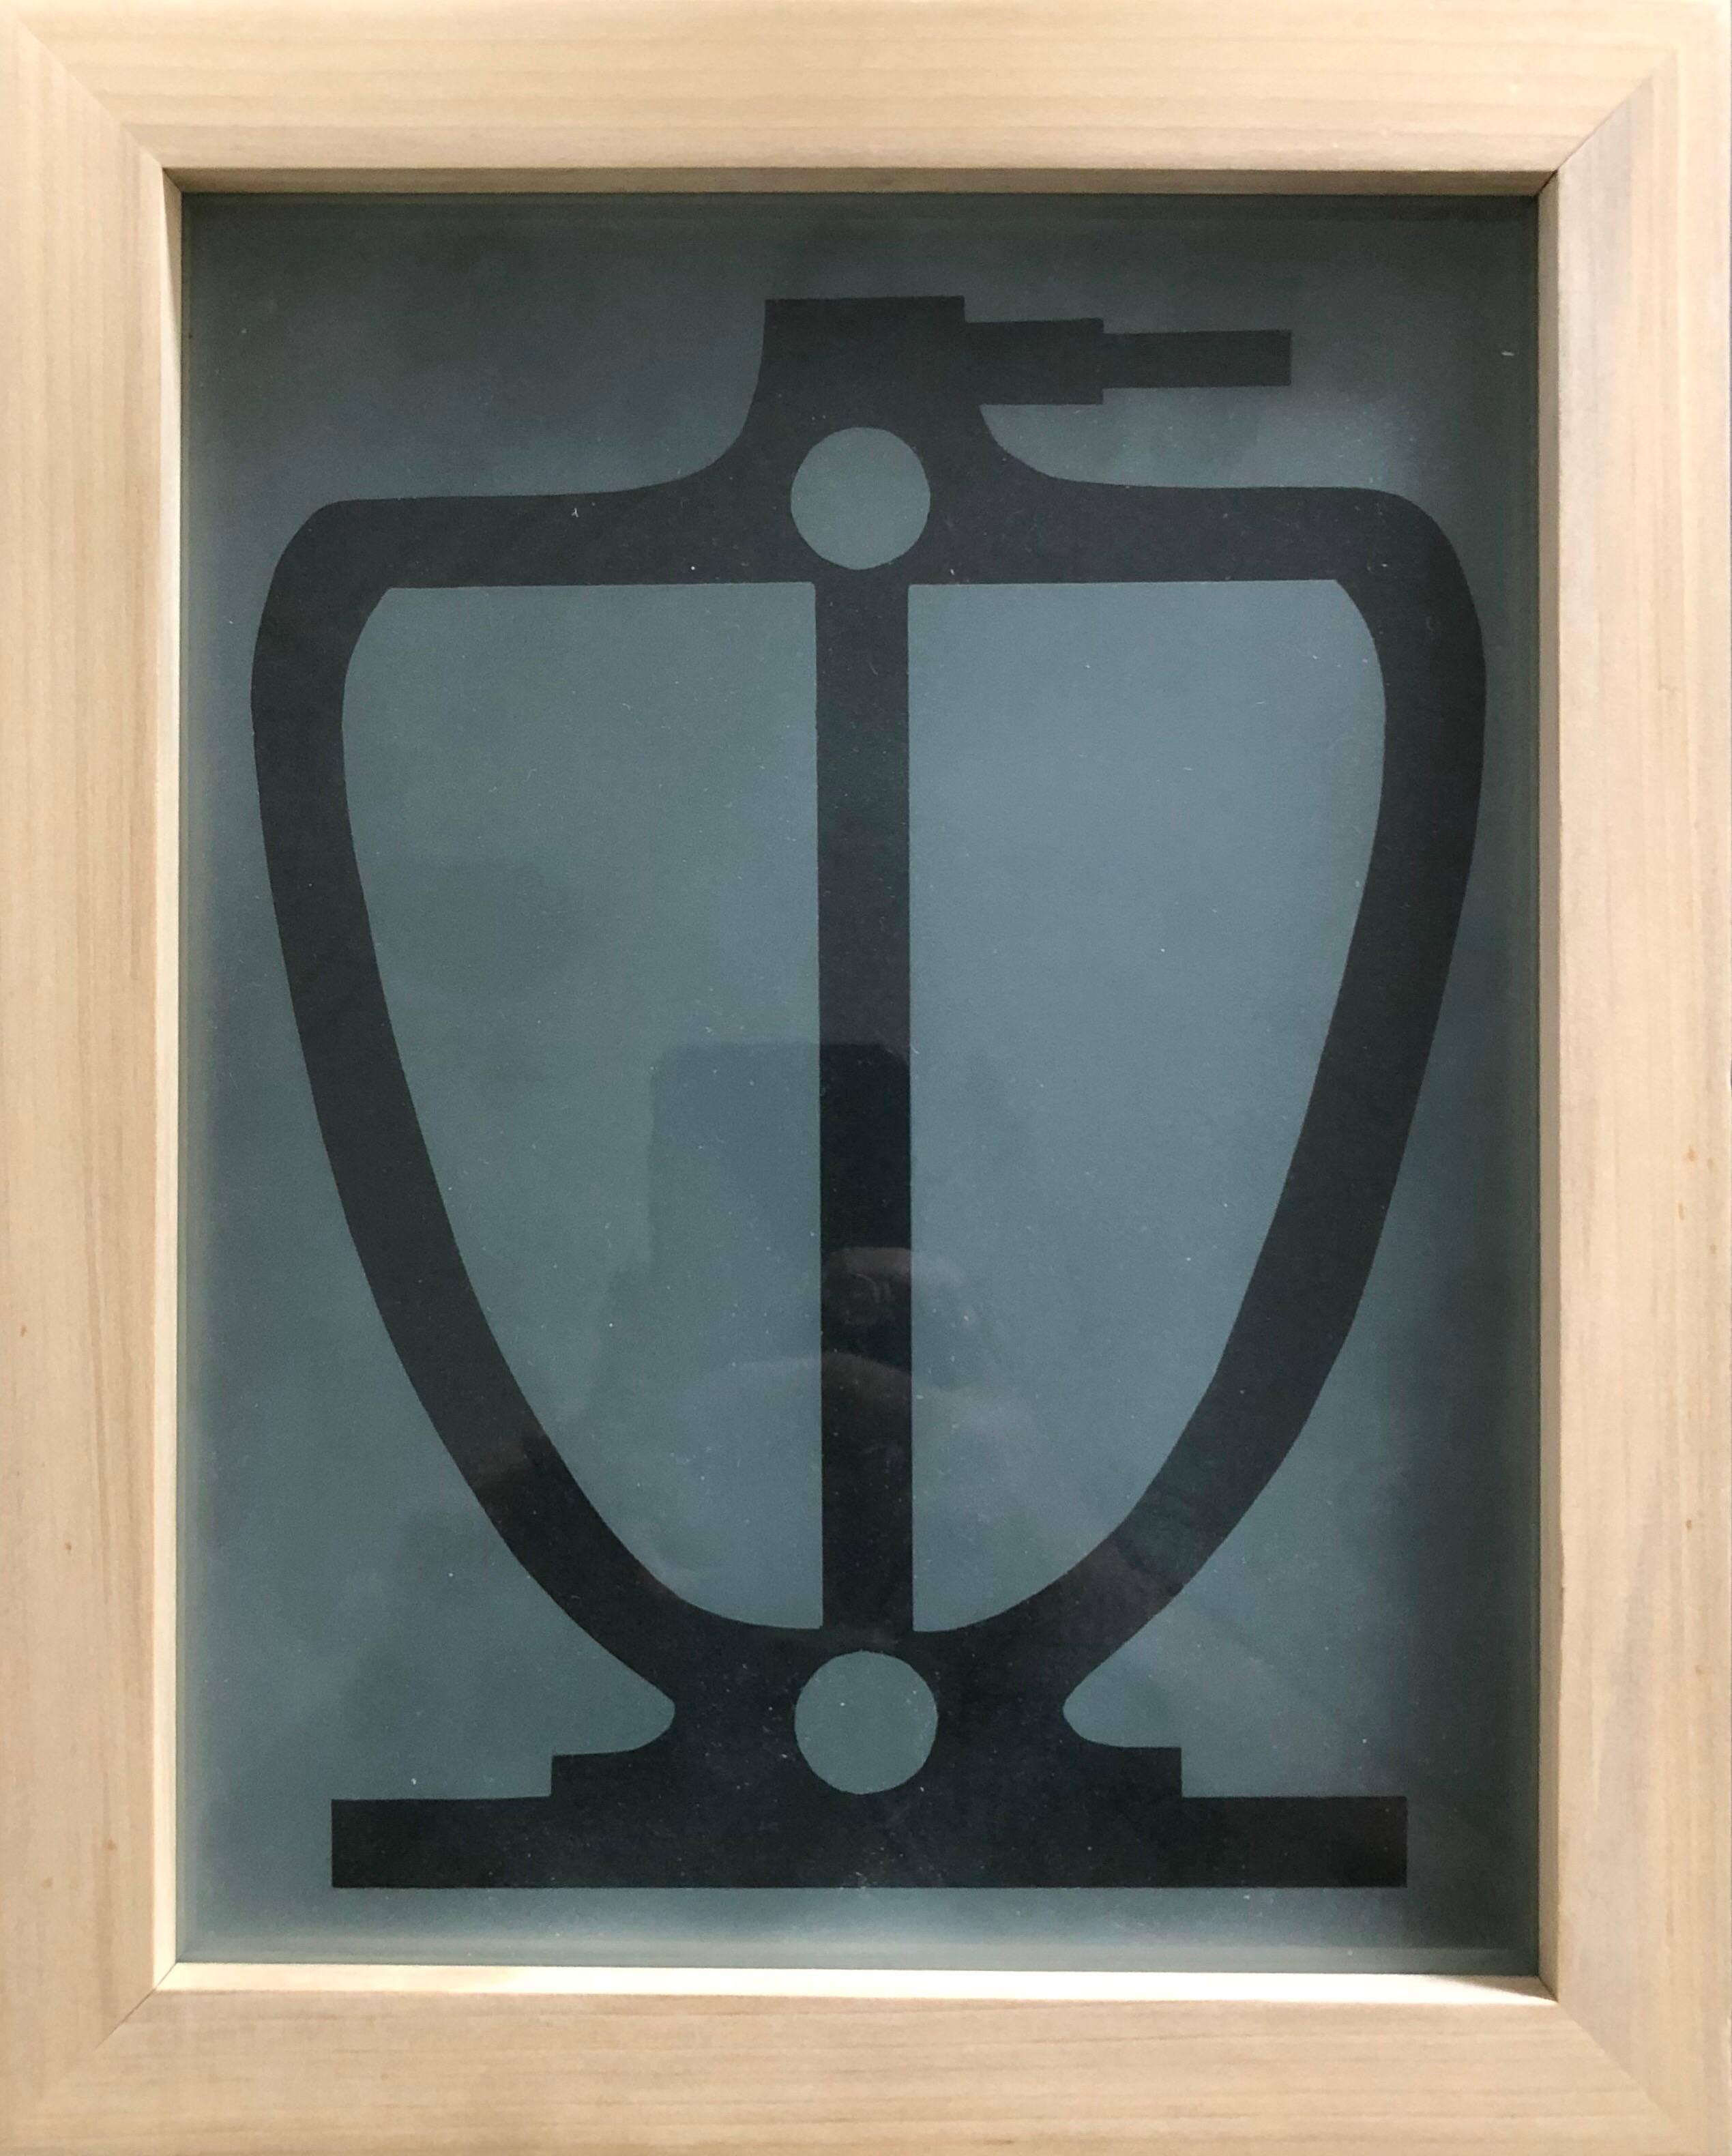 Acid etched Abstract Urn Glass Wall Sculpture Artwork Framed ed. 25 Signed